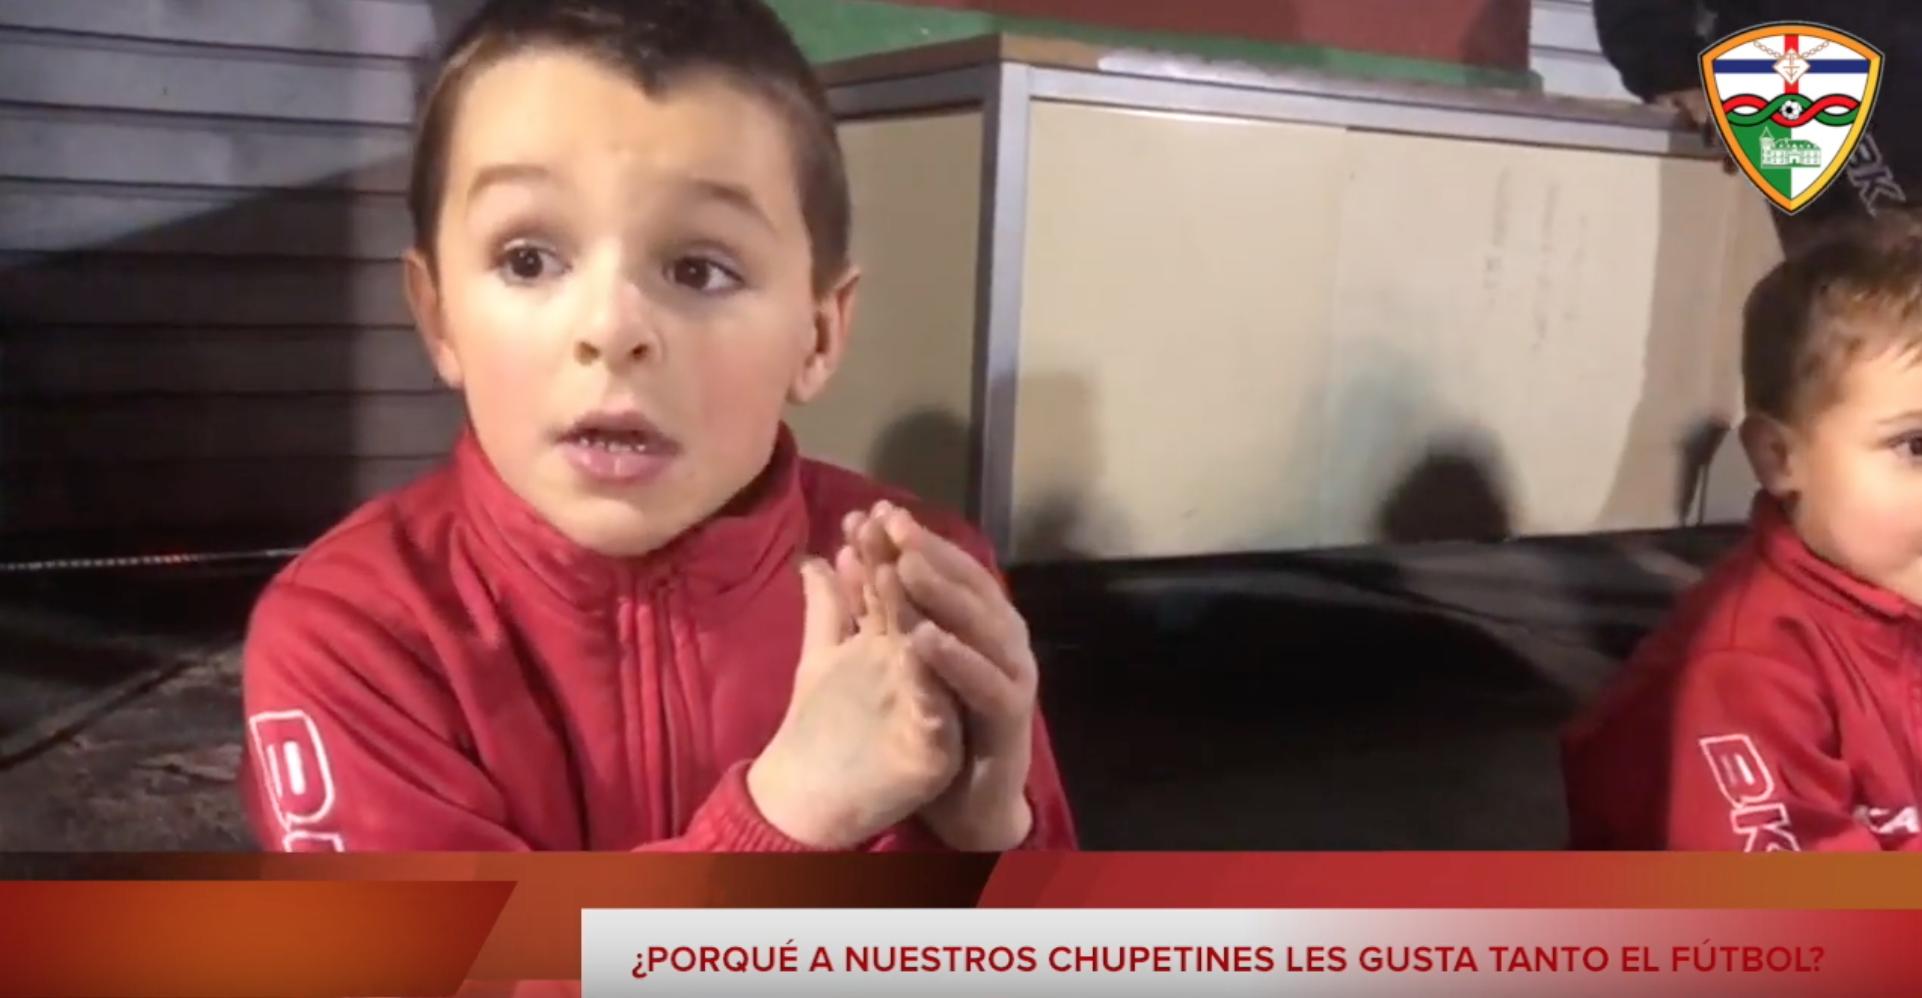 MI EQUIPO ESPECIAL/ Chupetines